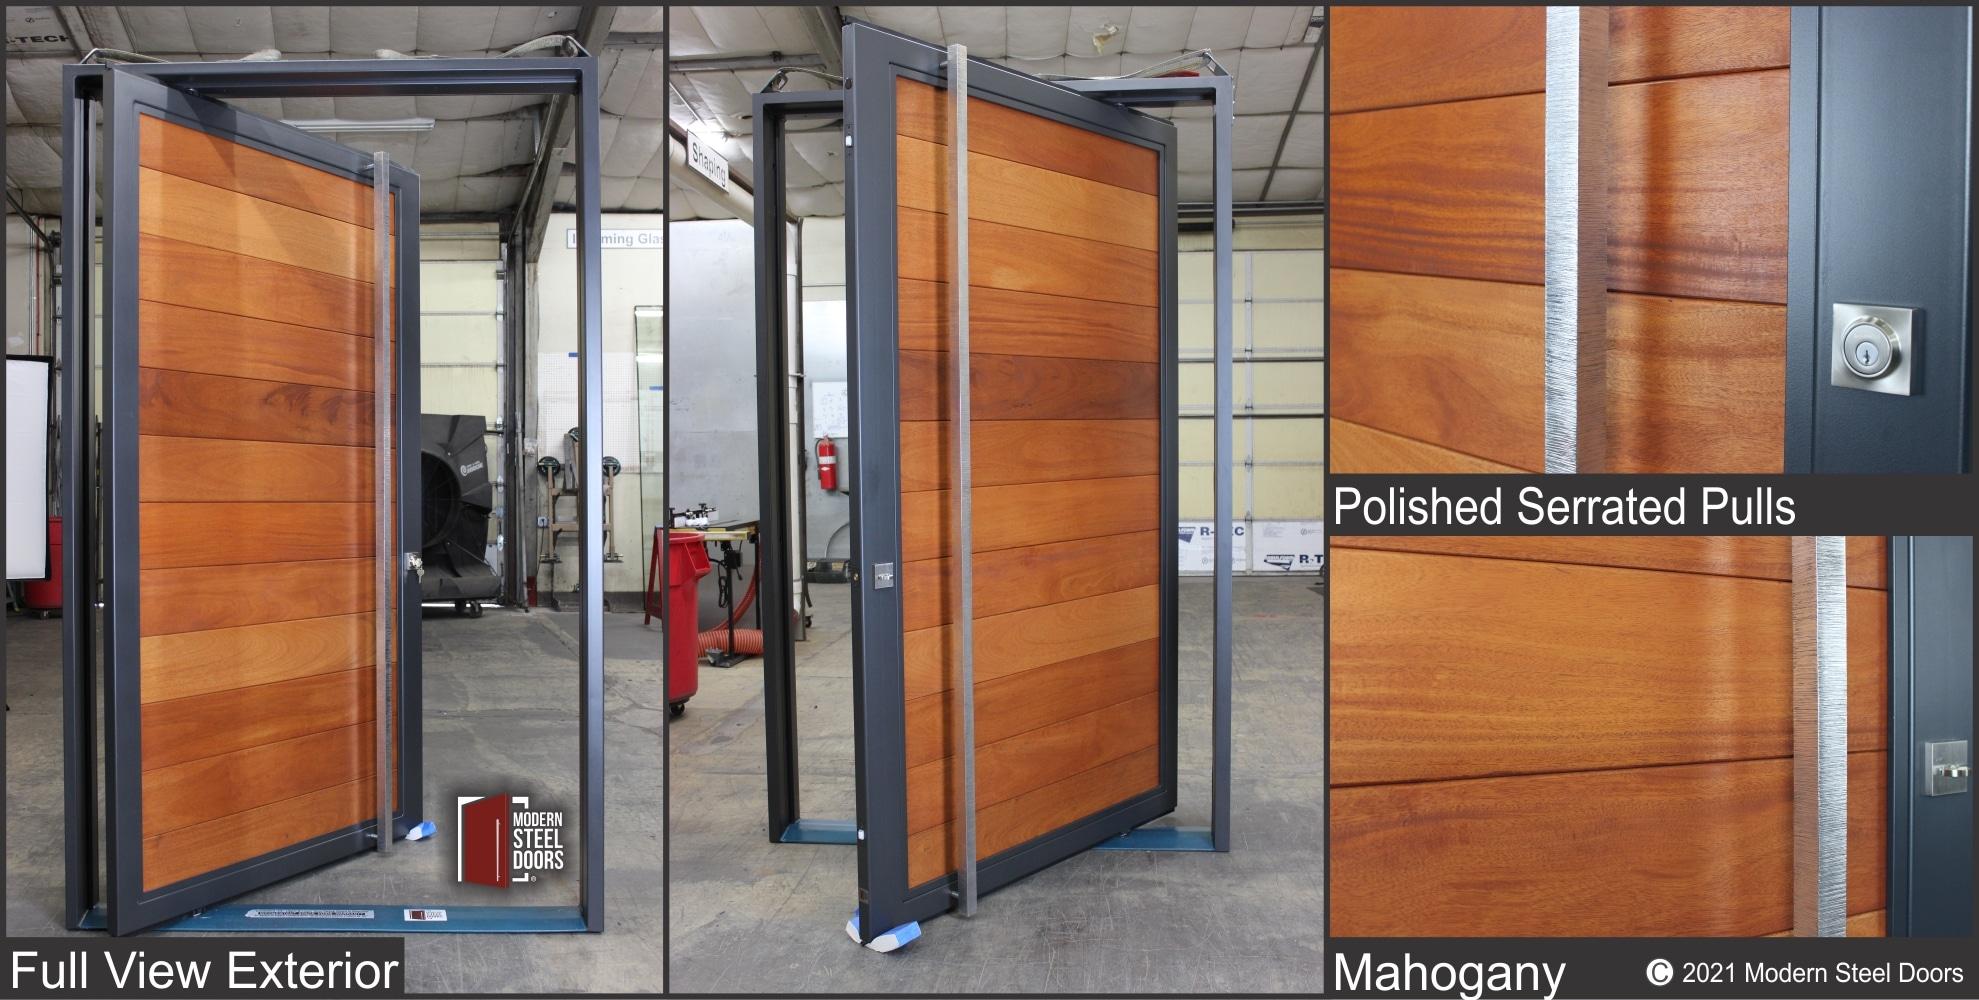 MAHOGANY FULL VIEW PIVOT DOOR WITH SCULPTED PULLS